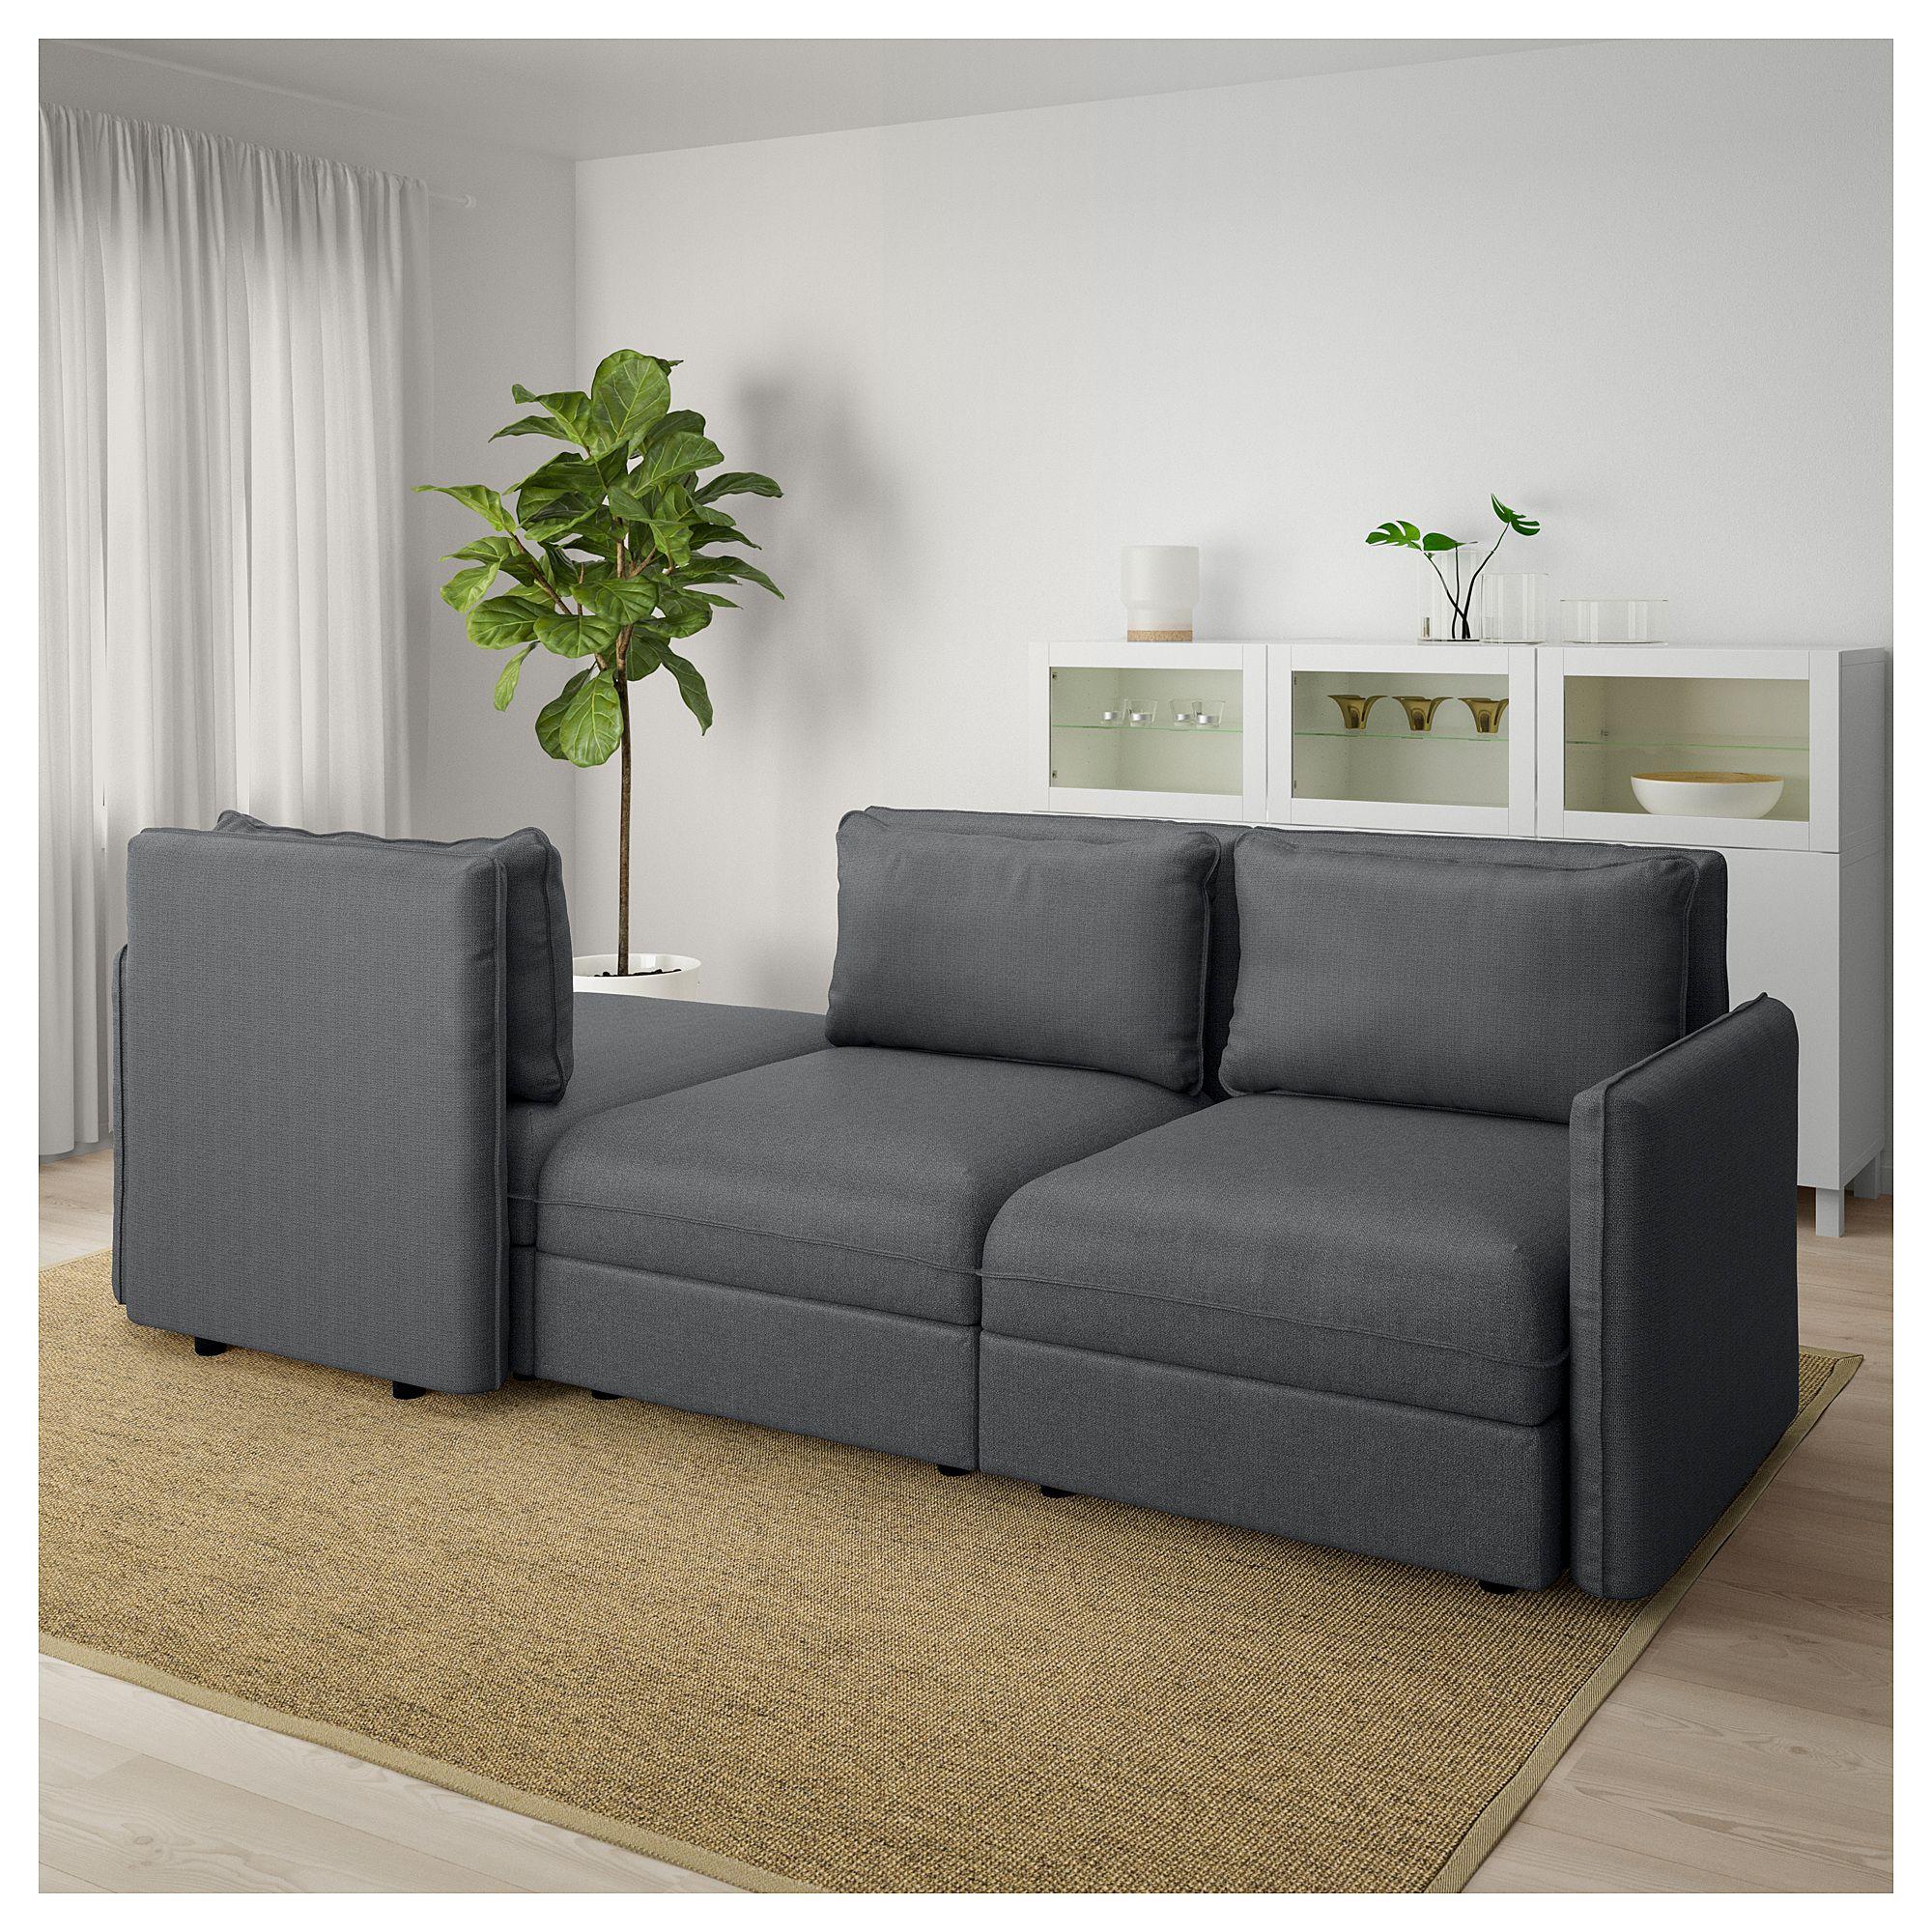 Furniture And Home Furnishings Products Home Furniture Ikea